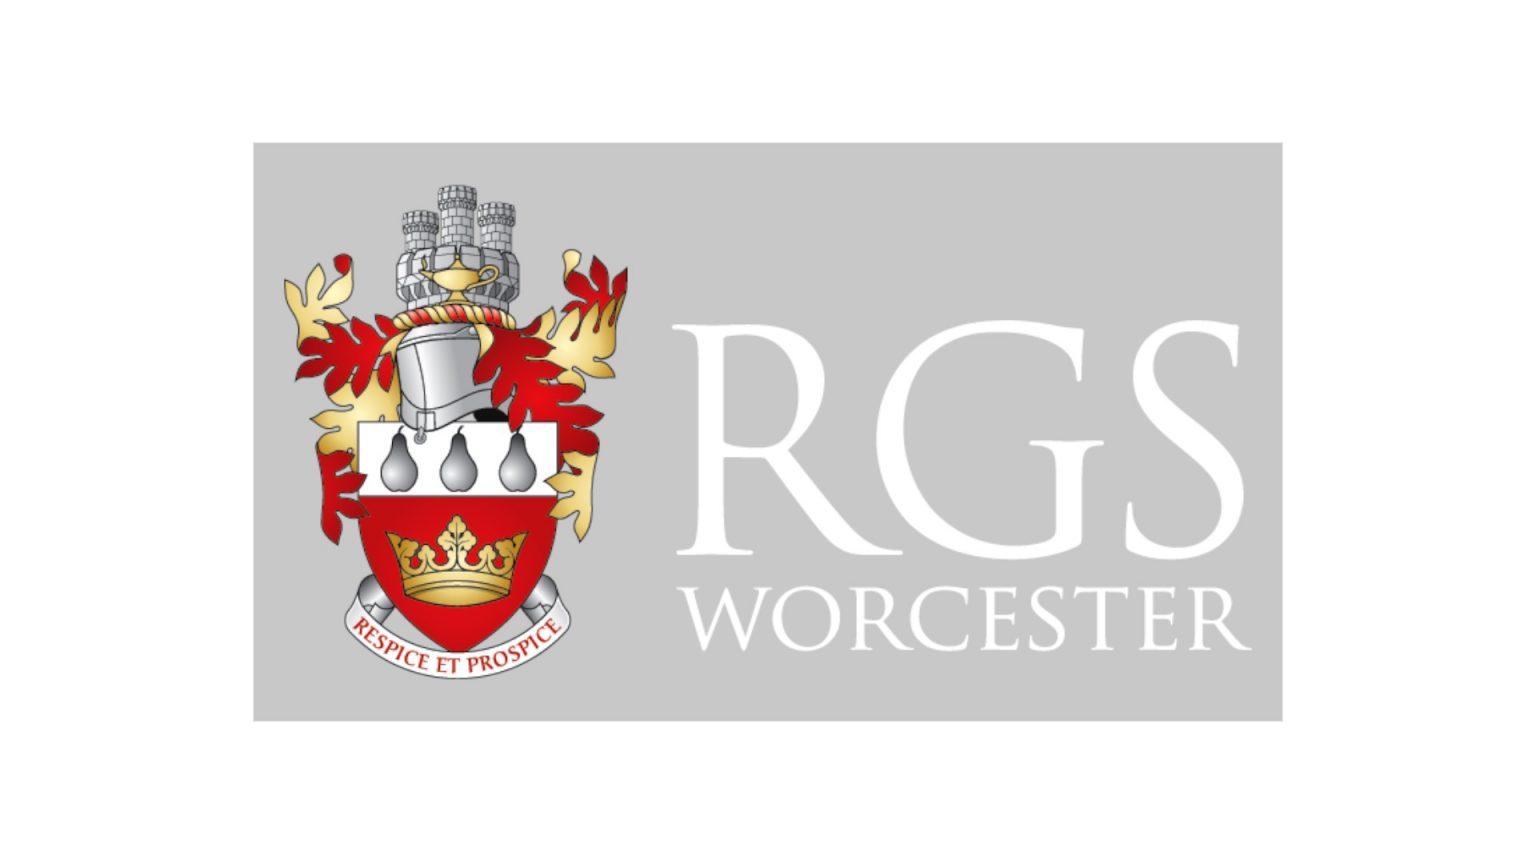 rgs logo playaround bigger again